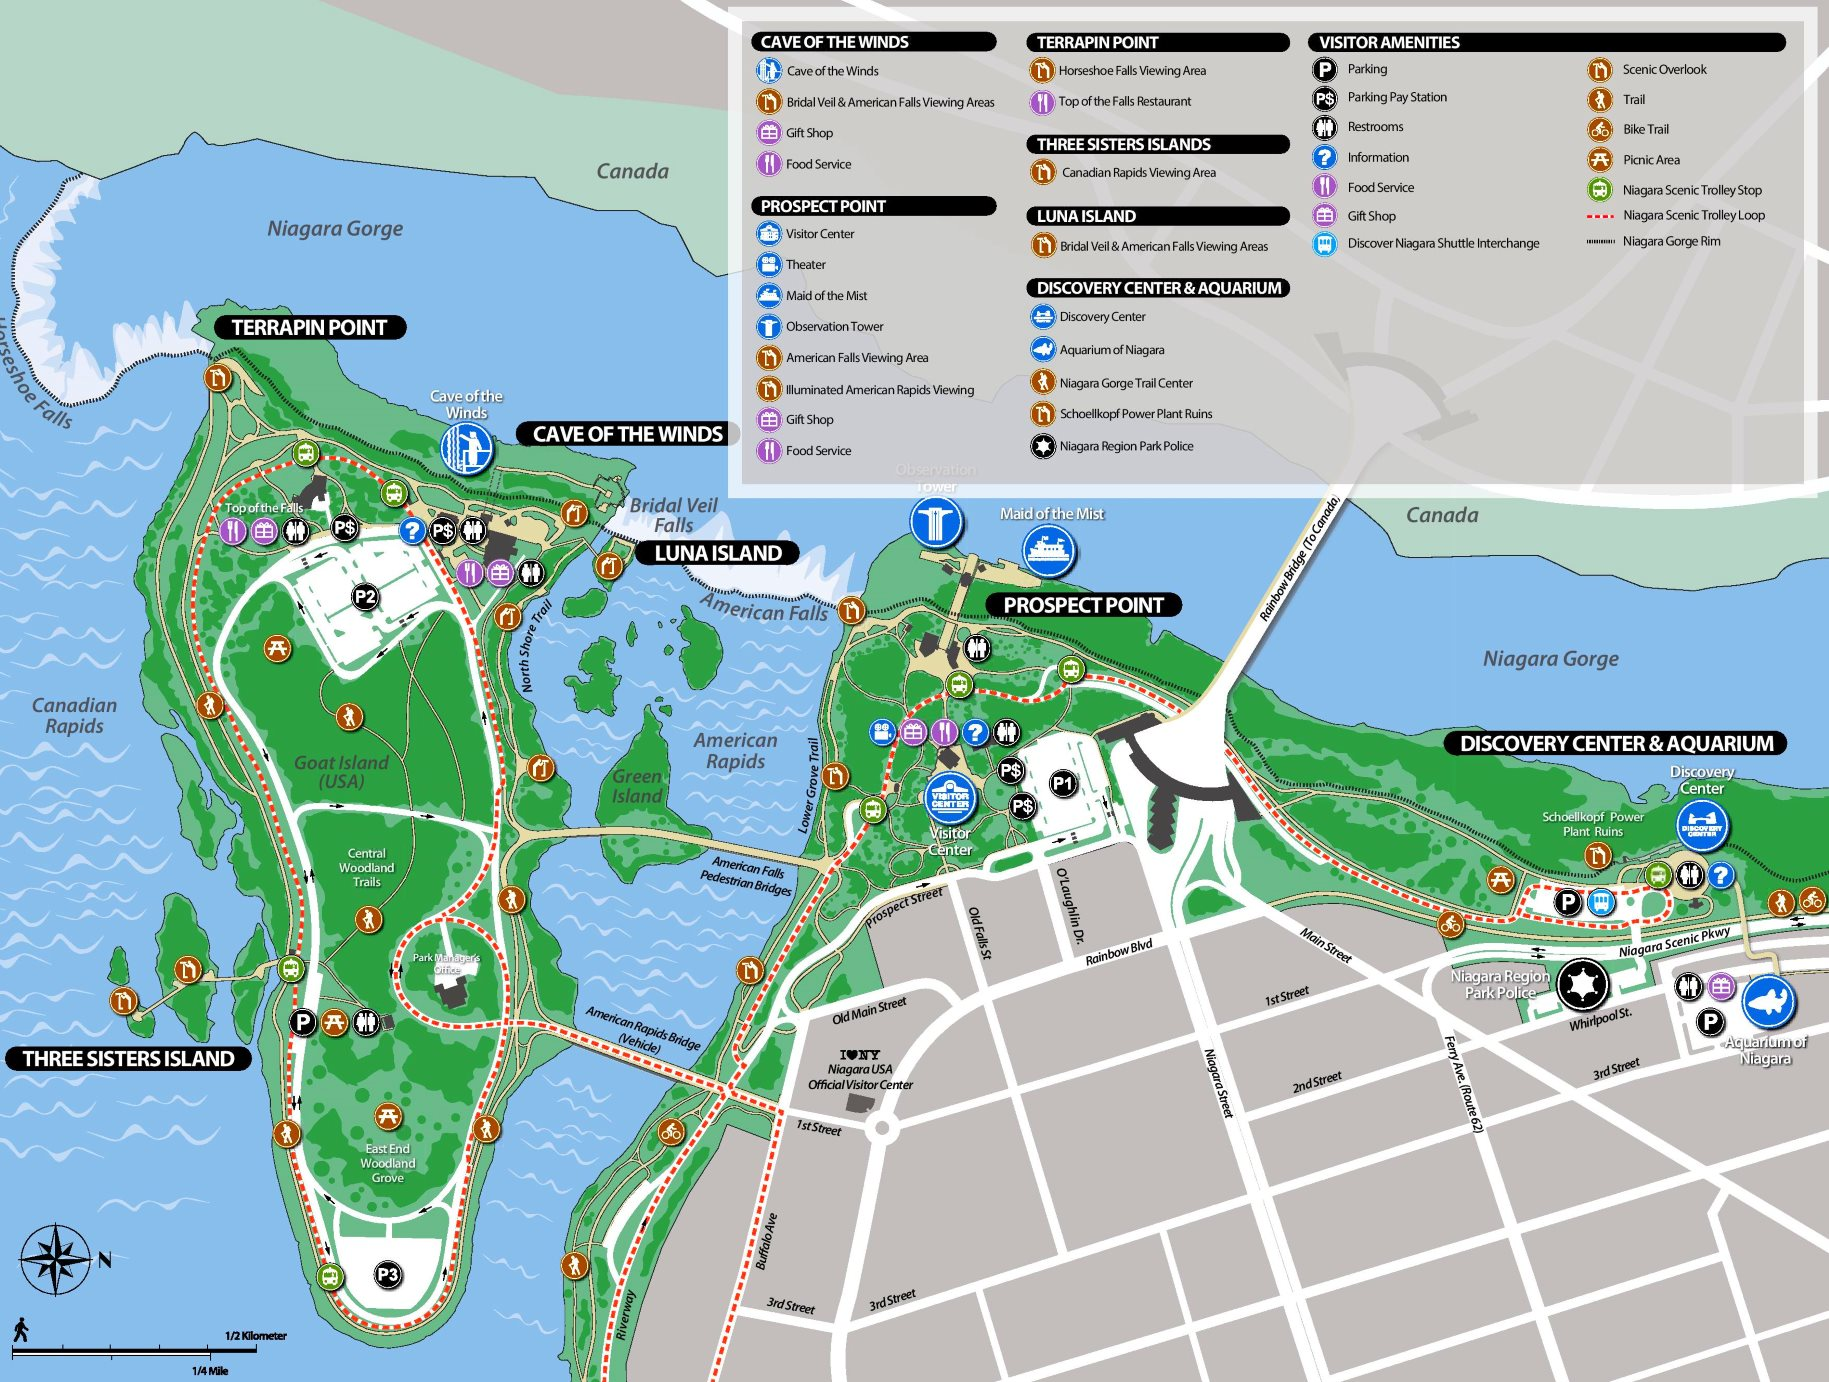 niagara falls tourism map Niagara Falls State Park Tourist Map niagara falls tourism map